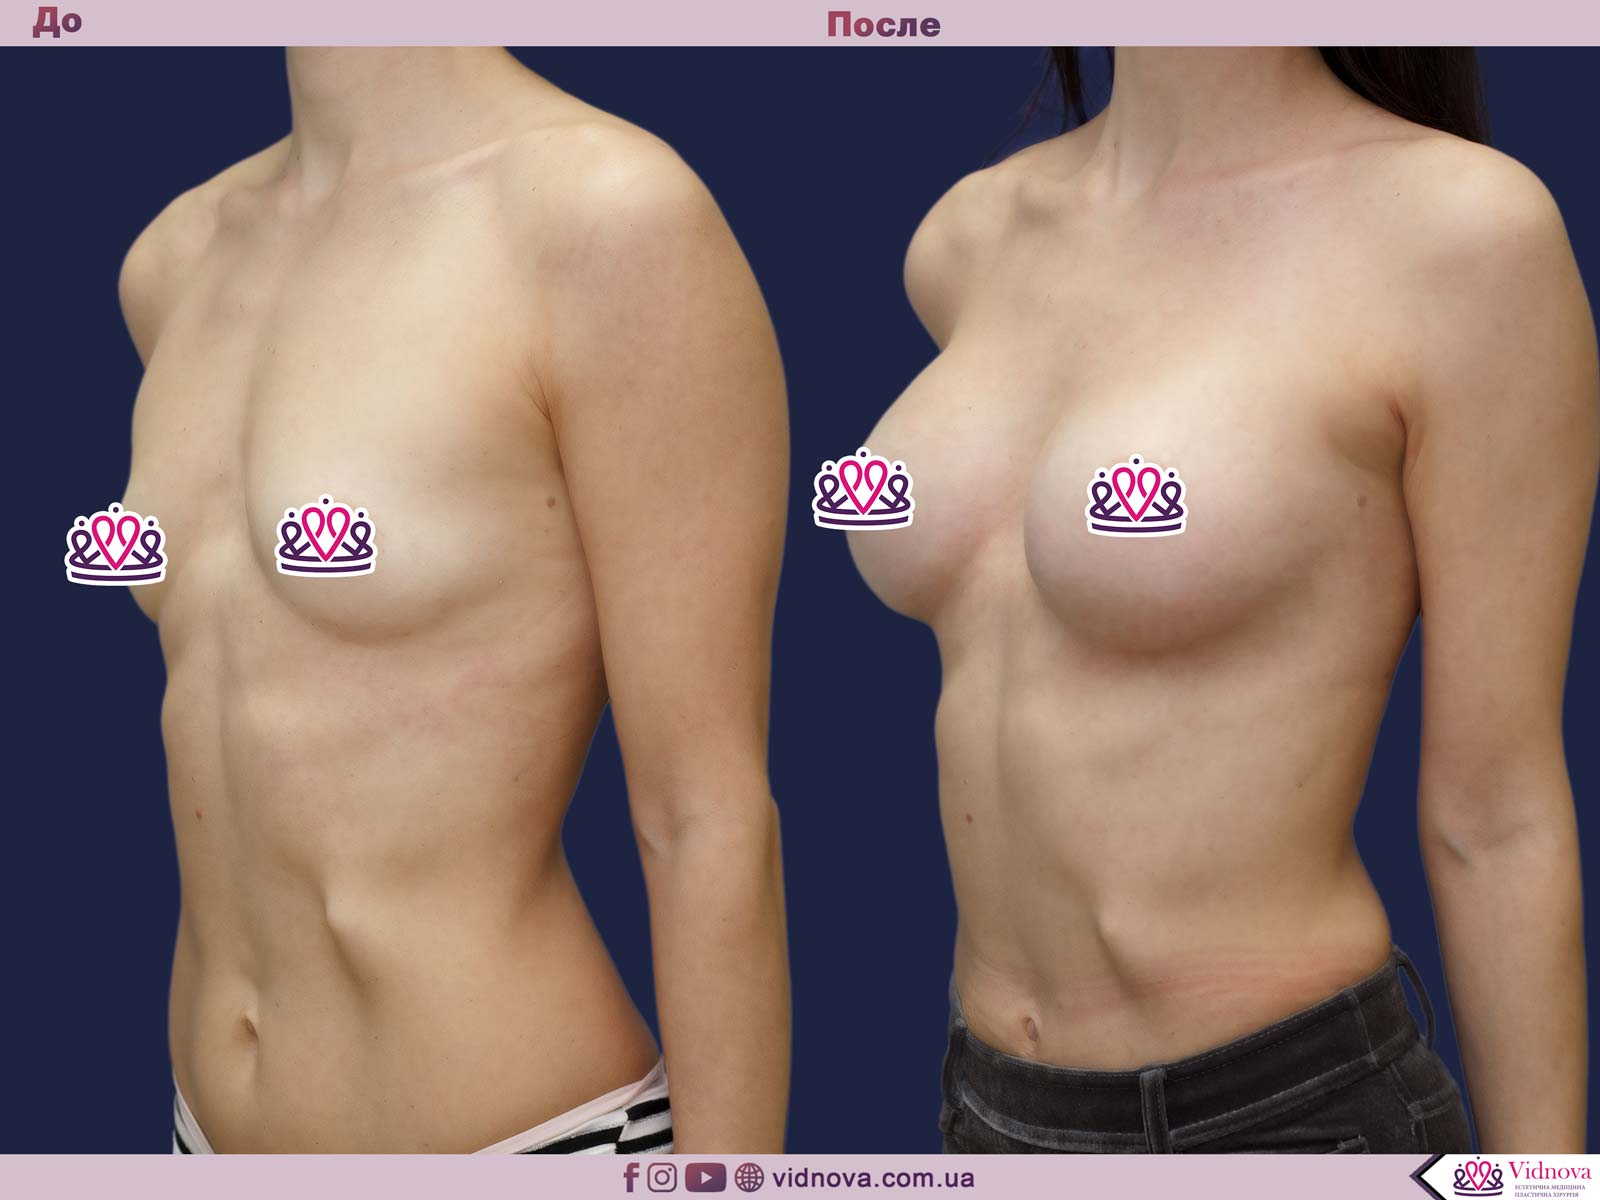 Увеличение груди: Фото ДО и ПОСЛЕ - Пример №69-2 - Клиника Vidnova